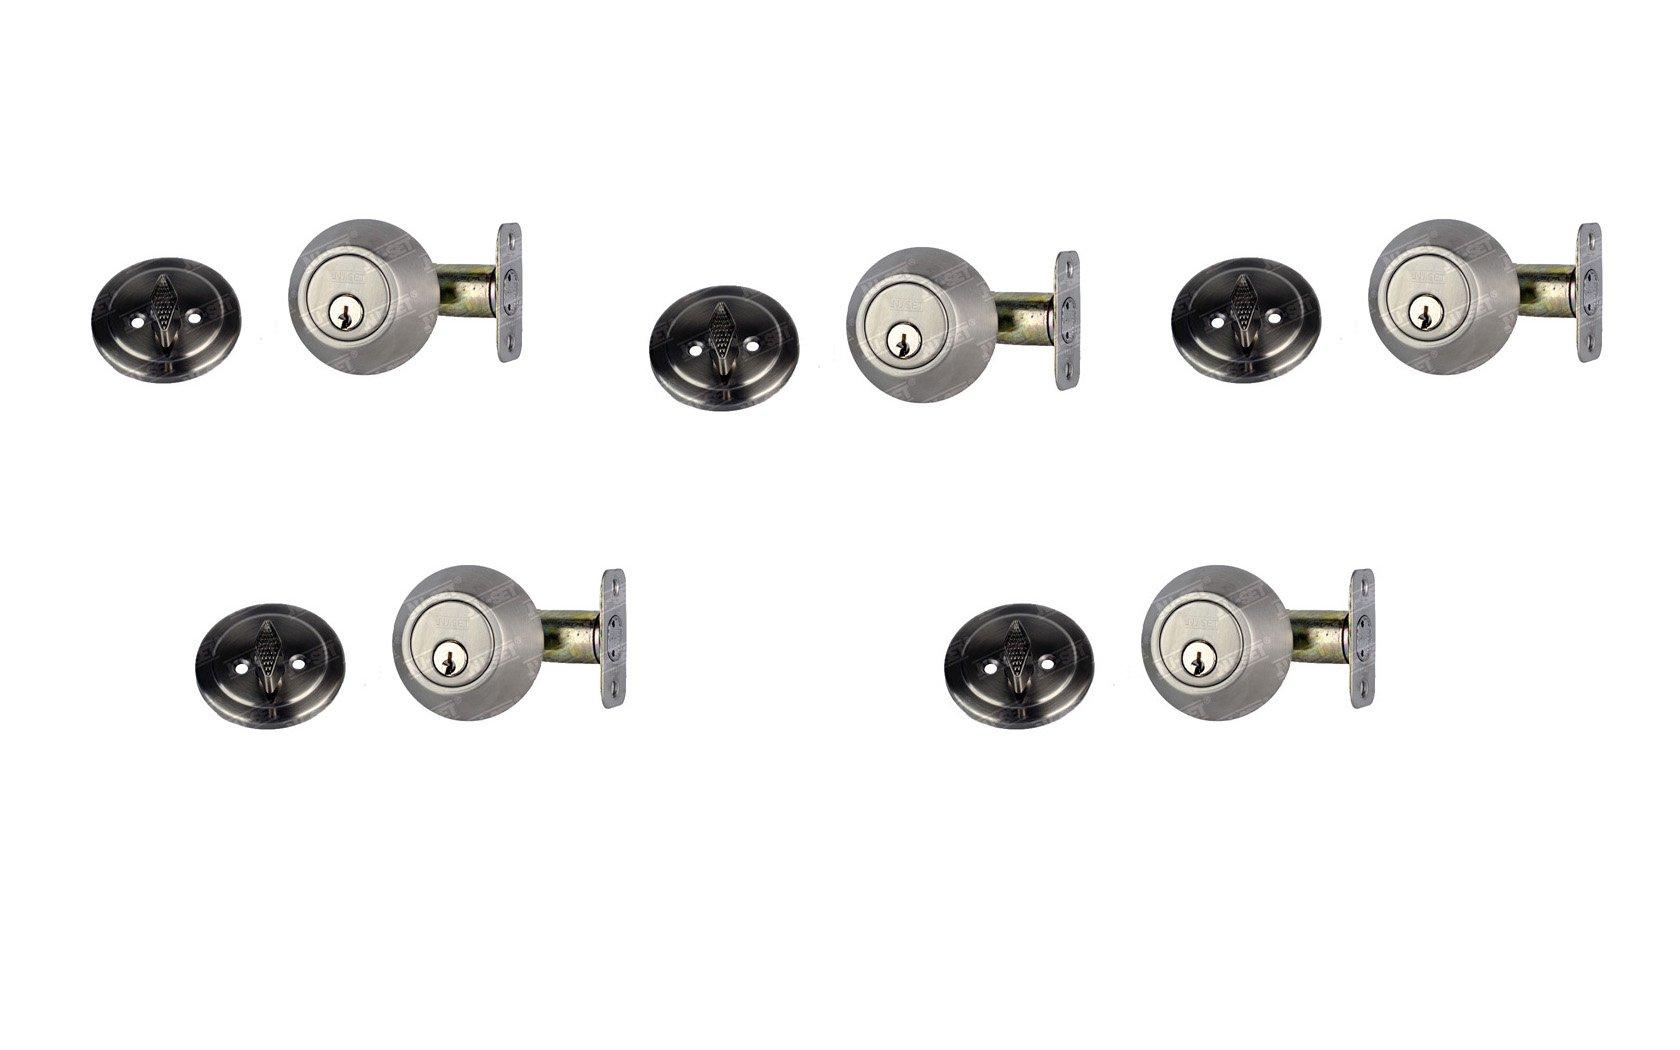 NuSet Single Cylinder Deadbolt, 5 Pack, Keyed Alike, Kwikset Keyway (Satin Stainless Steel)